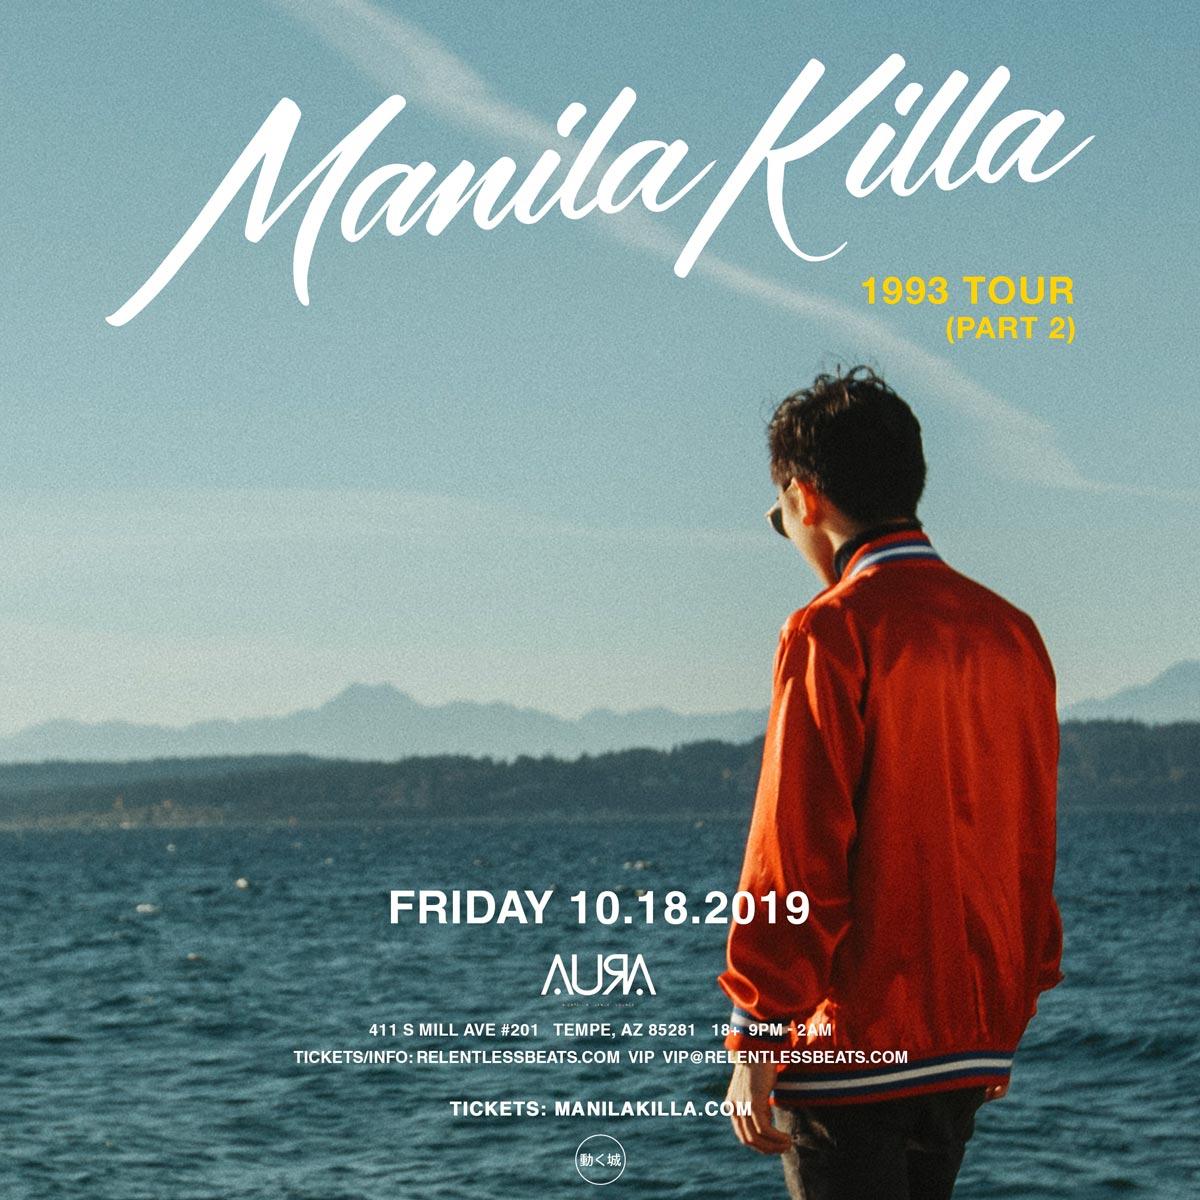 Flyer for Manila Killa